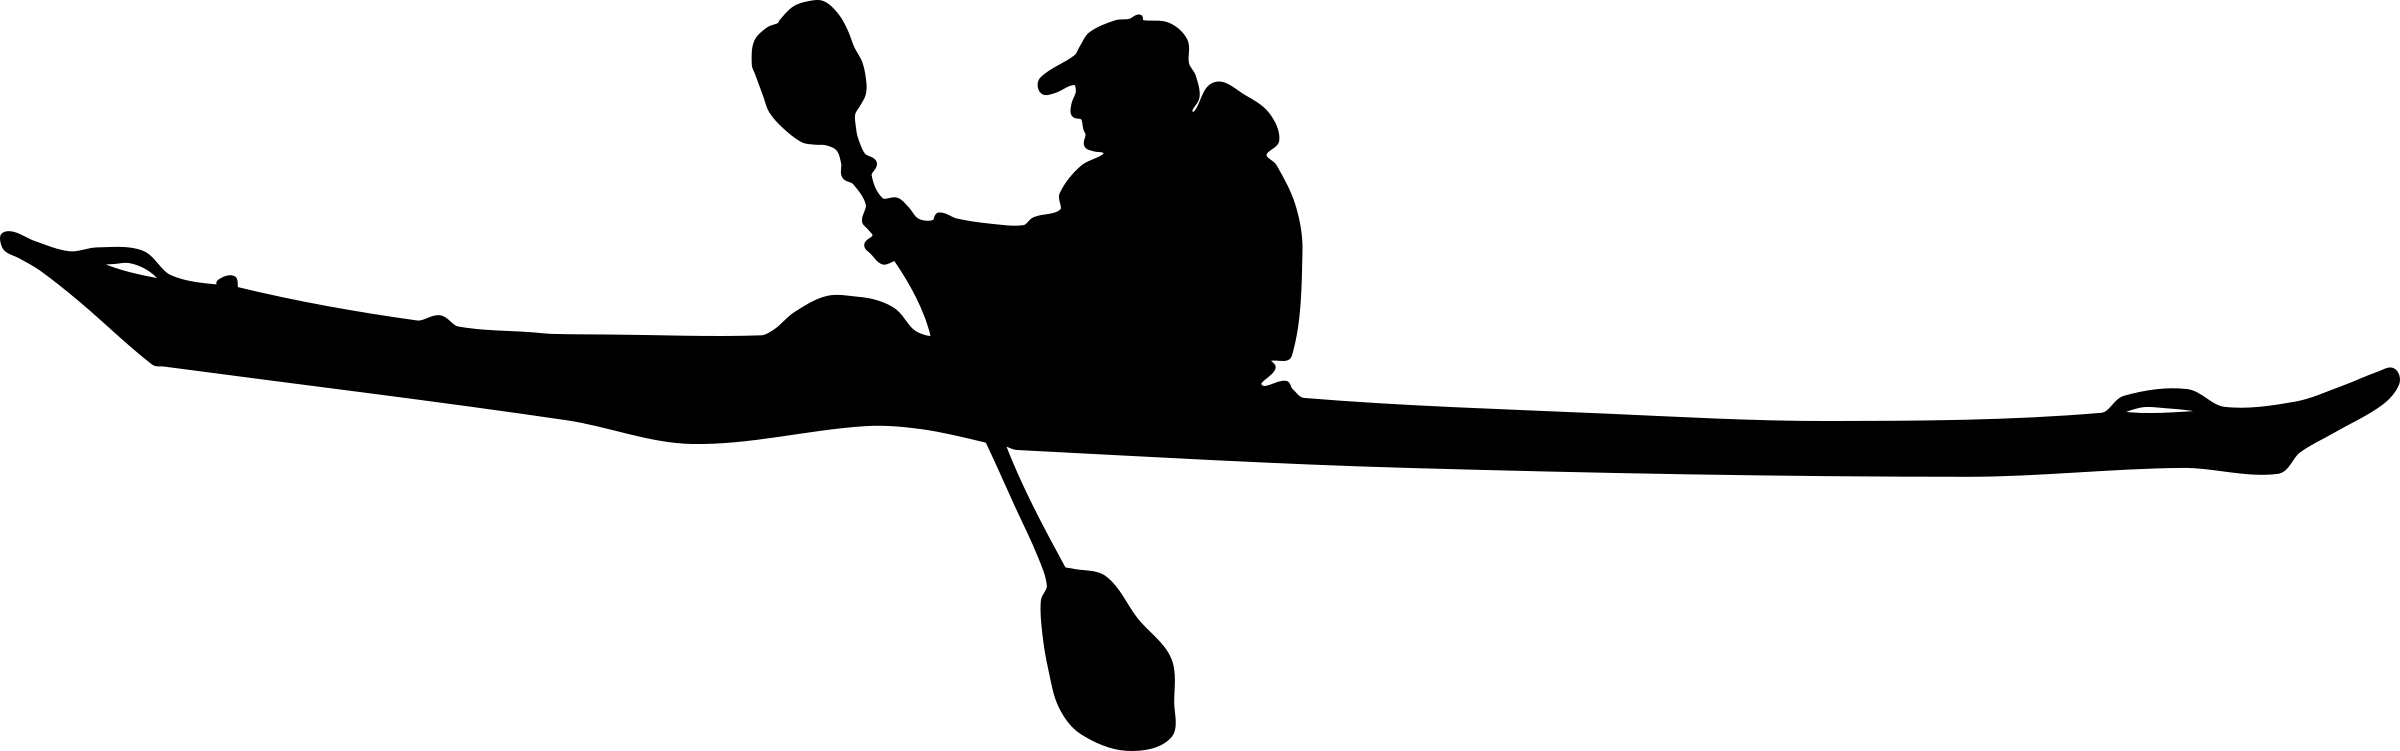 2400x751 Kayak Clipart Silhouette